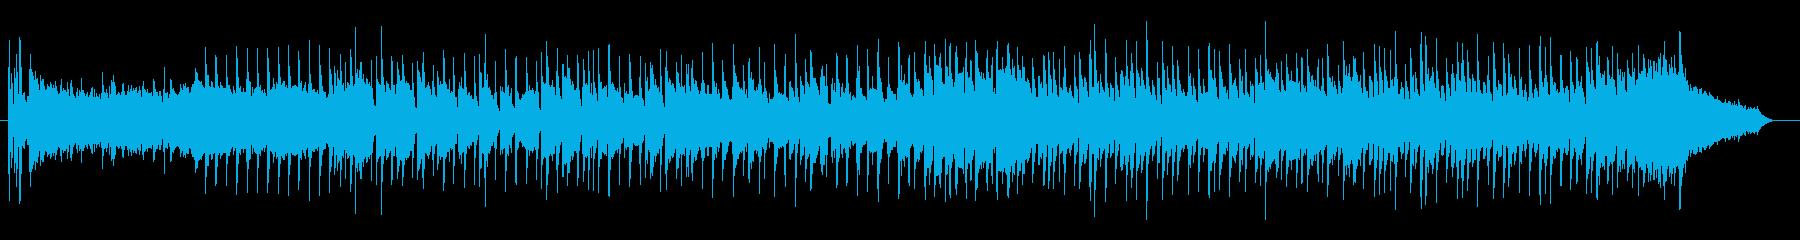 【ShortVer】12弦ギターメロディの再生済みの波形